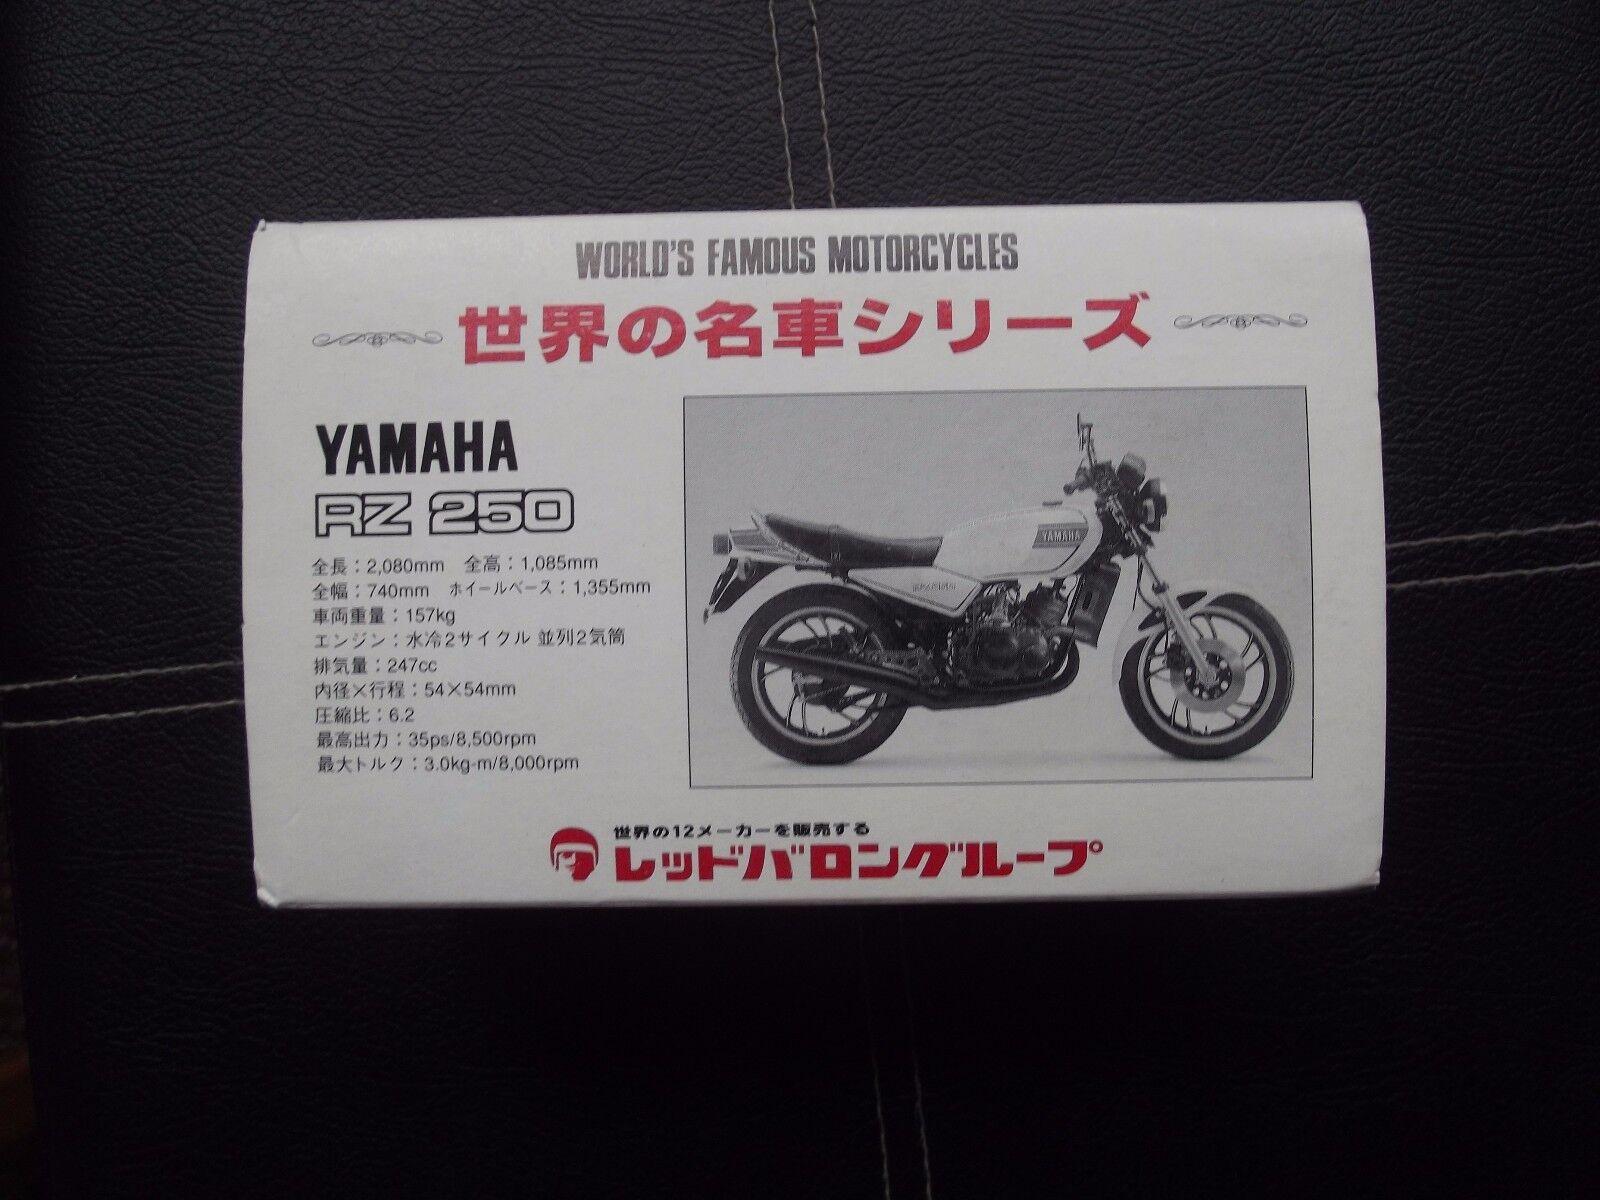 Wolrld bekannte motorräder, yamaha rz250 (rd250) modell   200